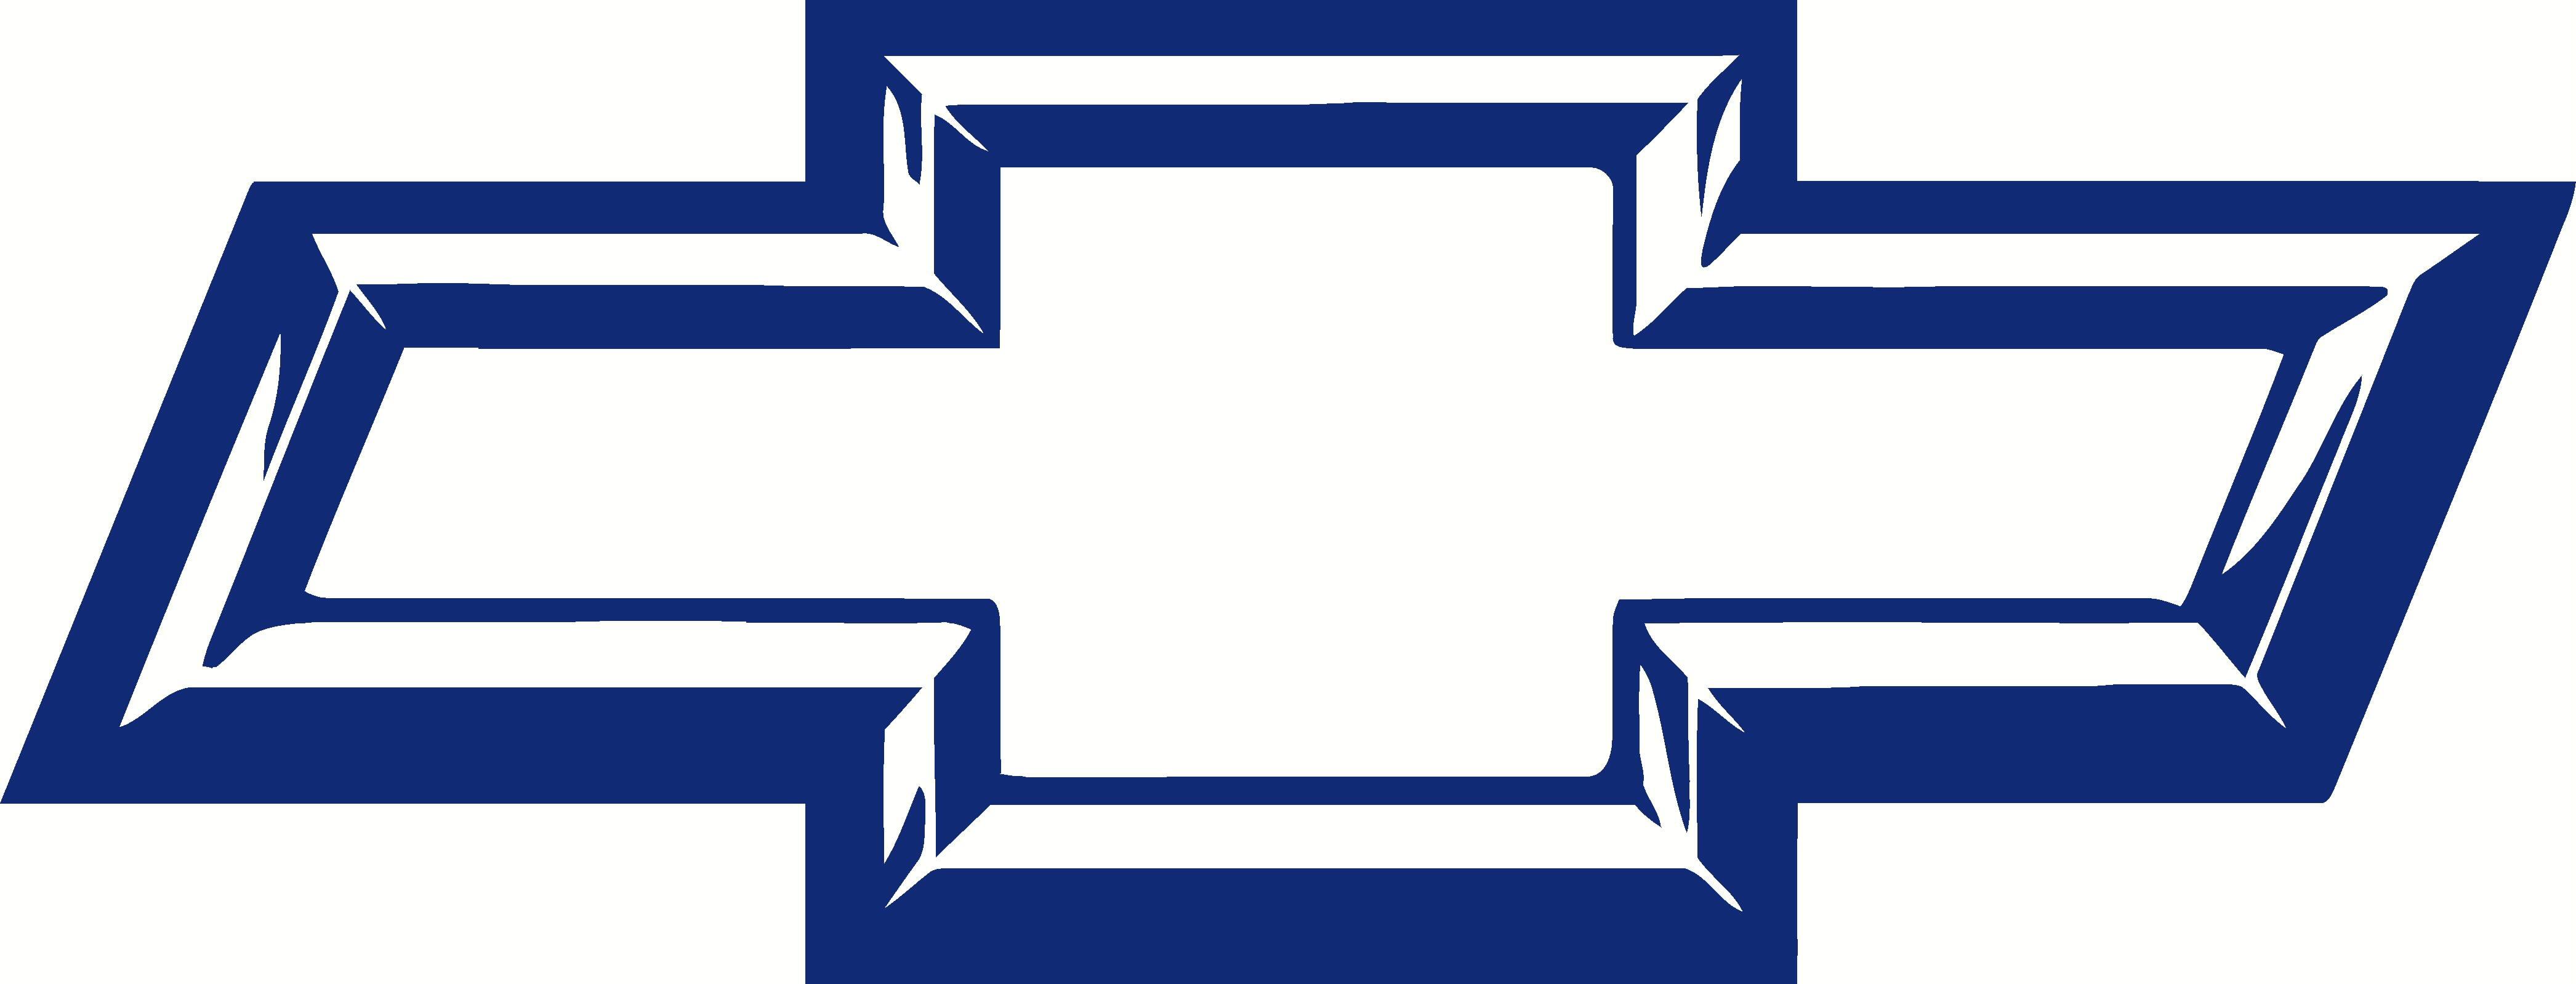 Chevy Logo - ClipArt Best (4184 x 1599 Pixel)